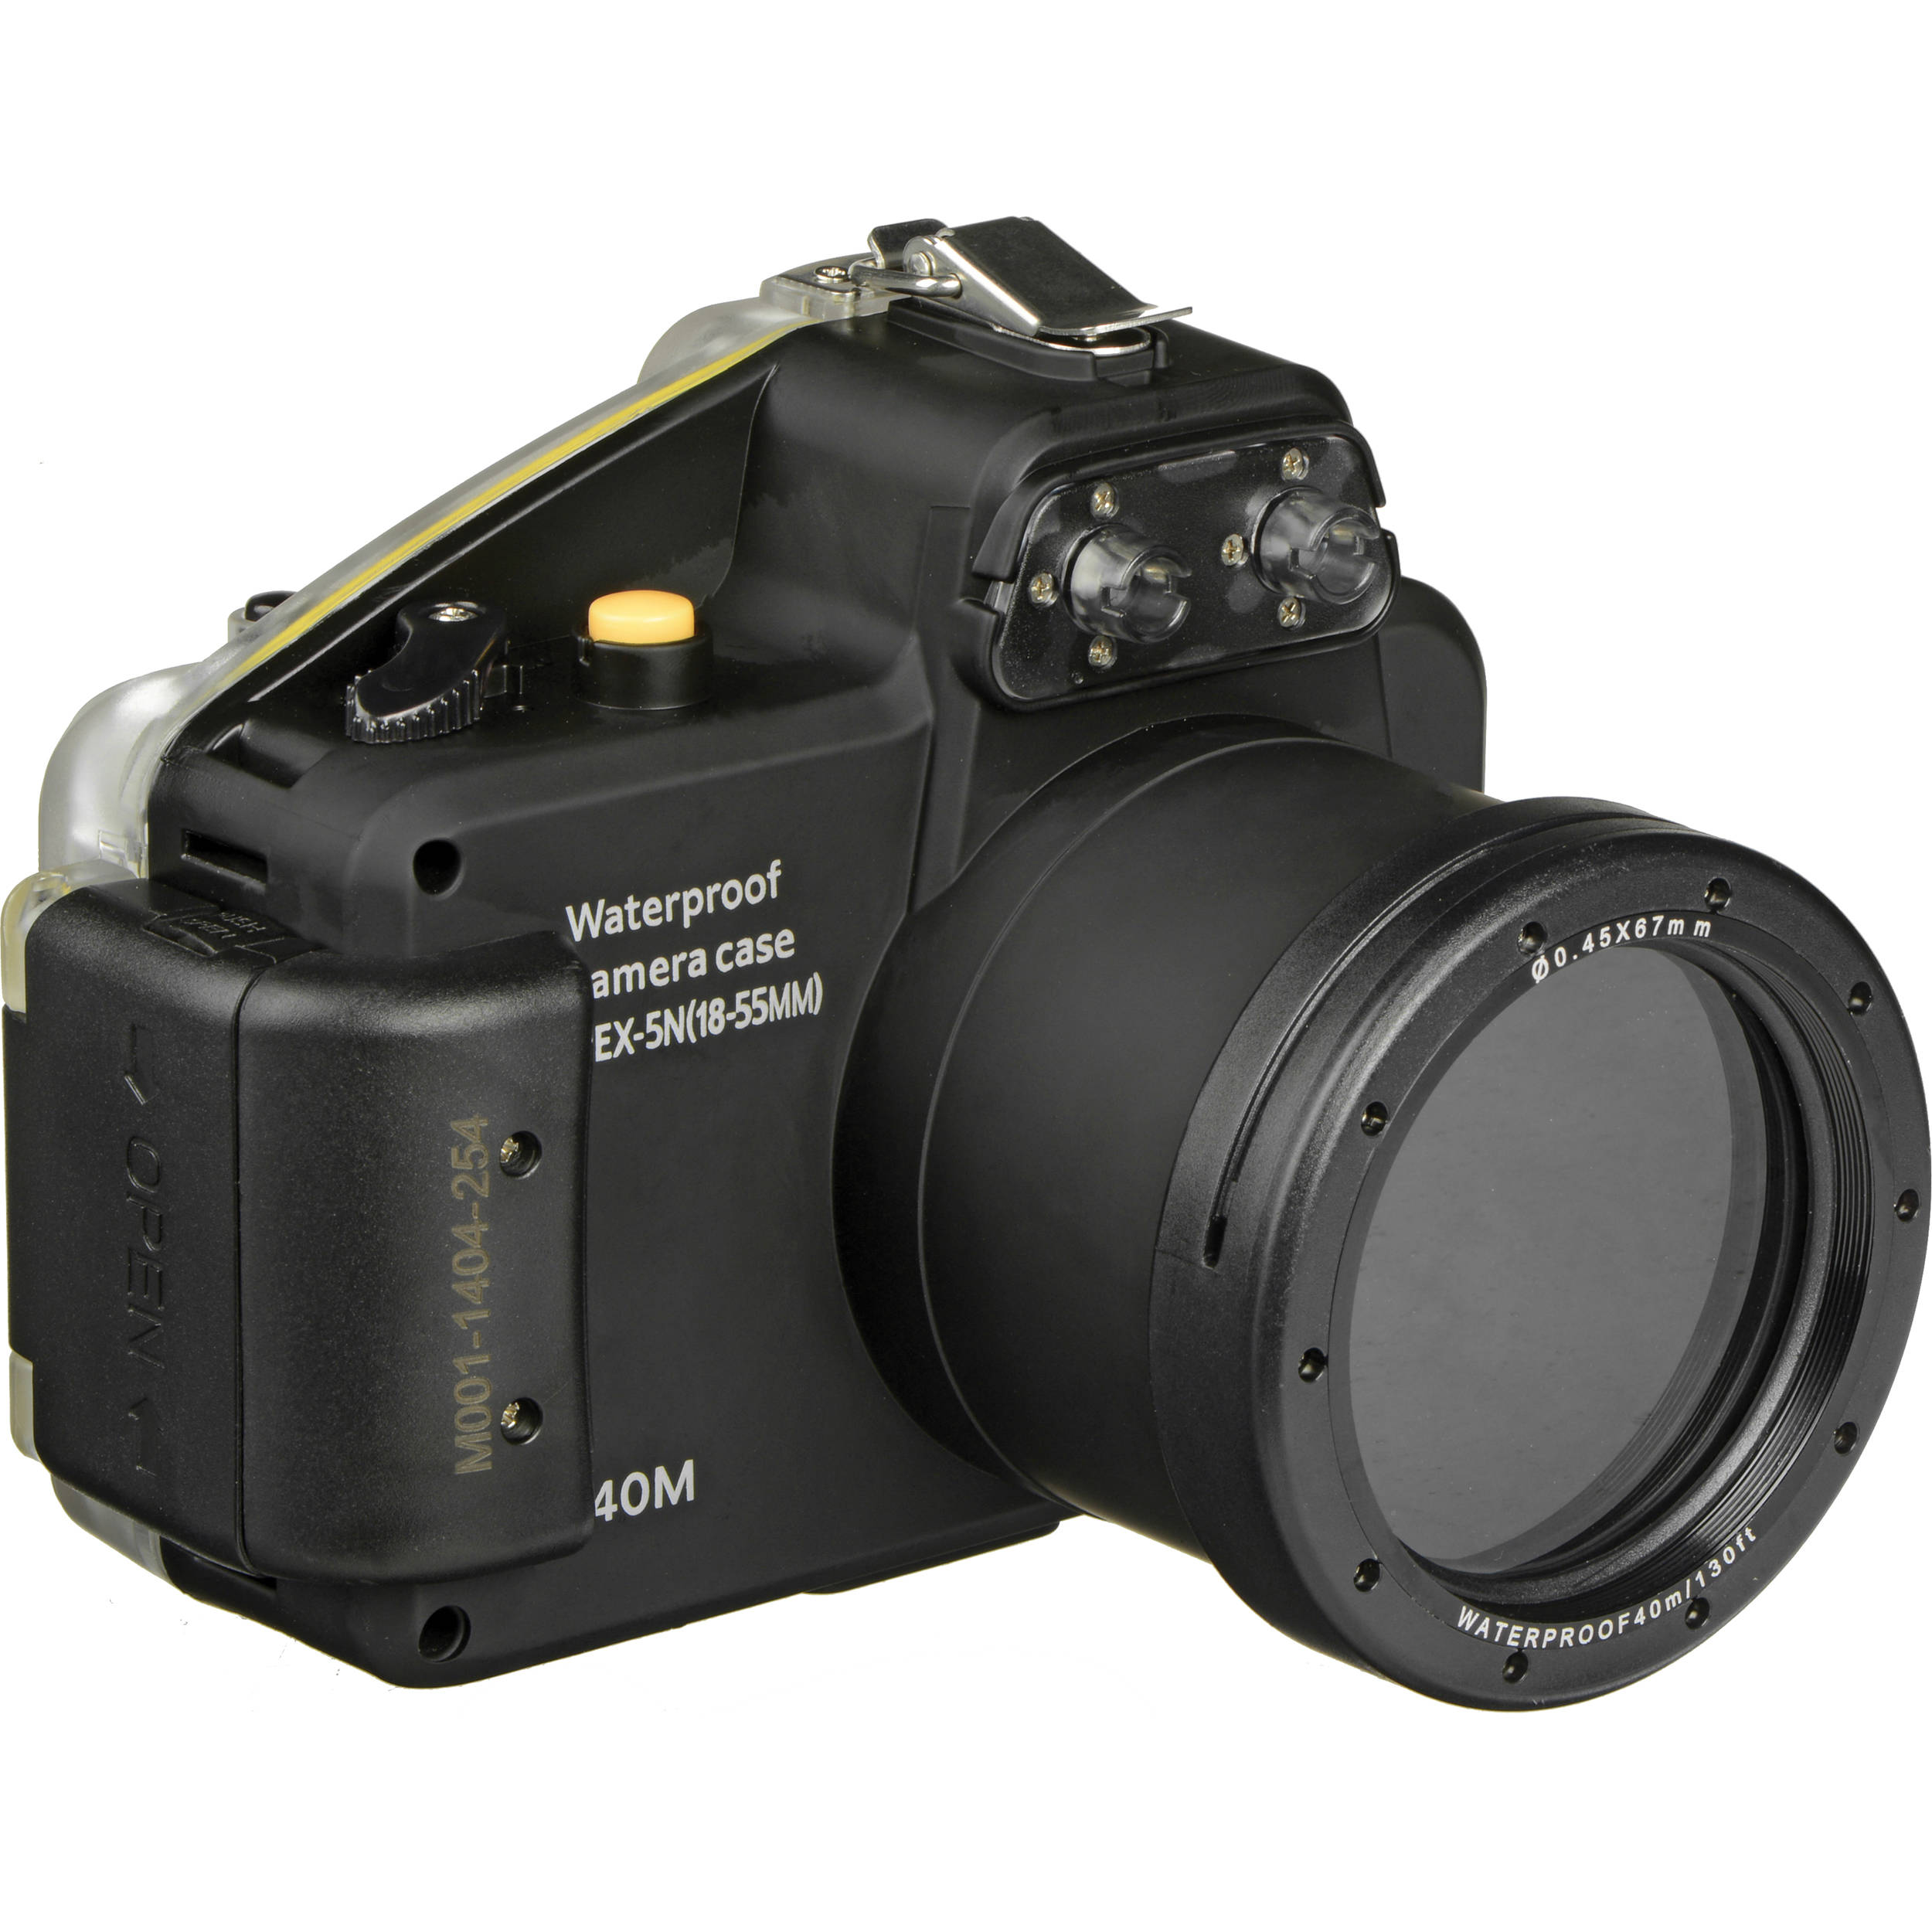 sony nex 5. polaroid underwater housing for sony alpha nex-5n digital camera and 18-55mm lens nex 5